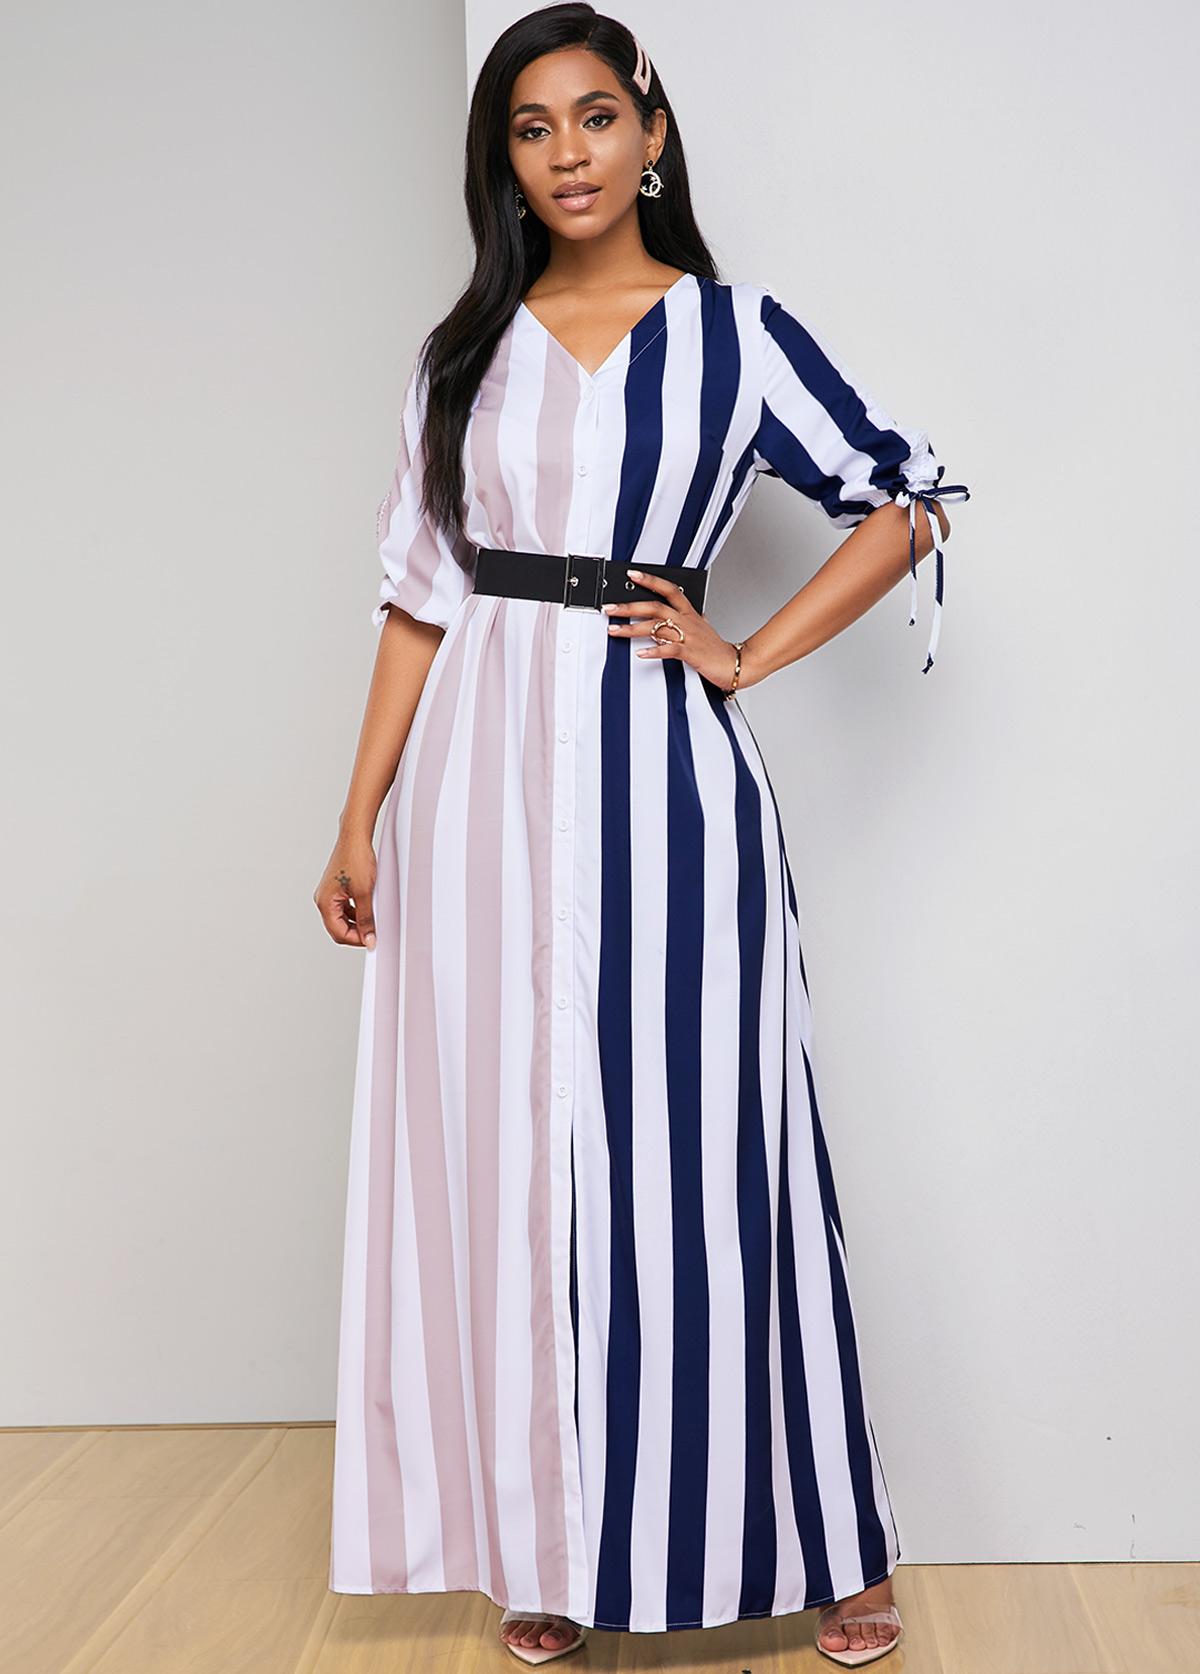 ROTITA Contrast Striped Drawstring Sleeve Maxi Dress